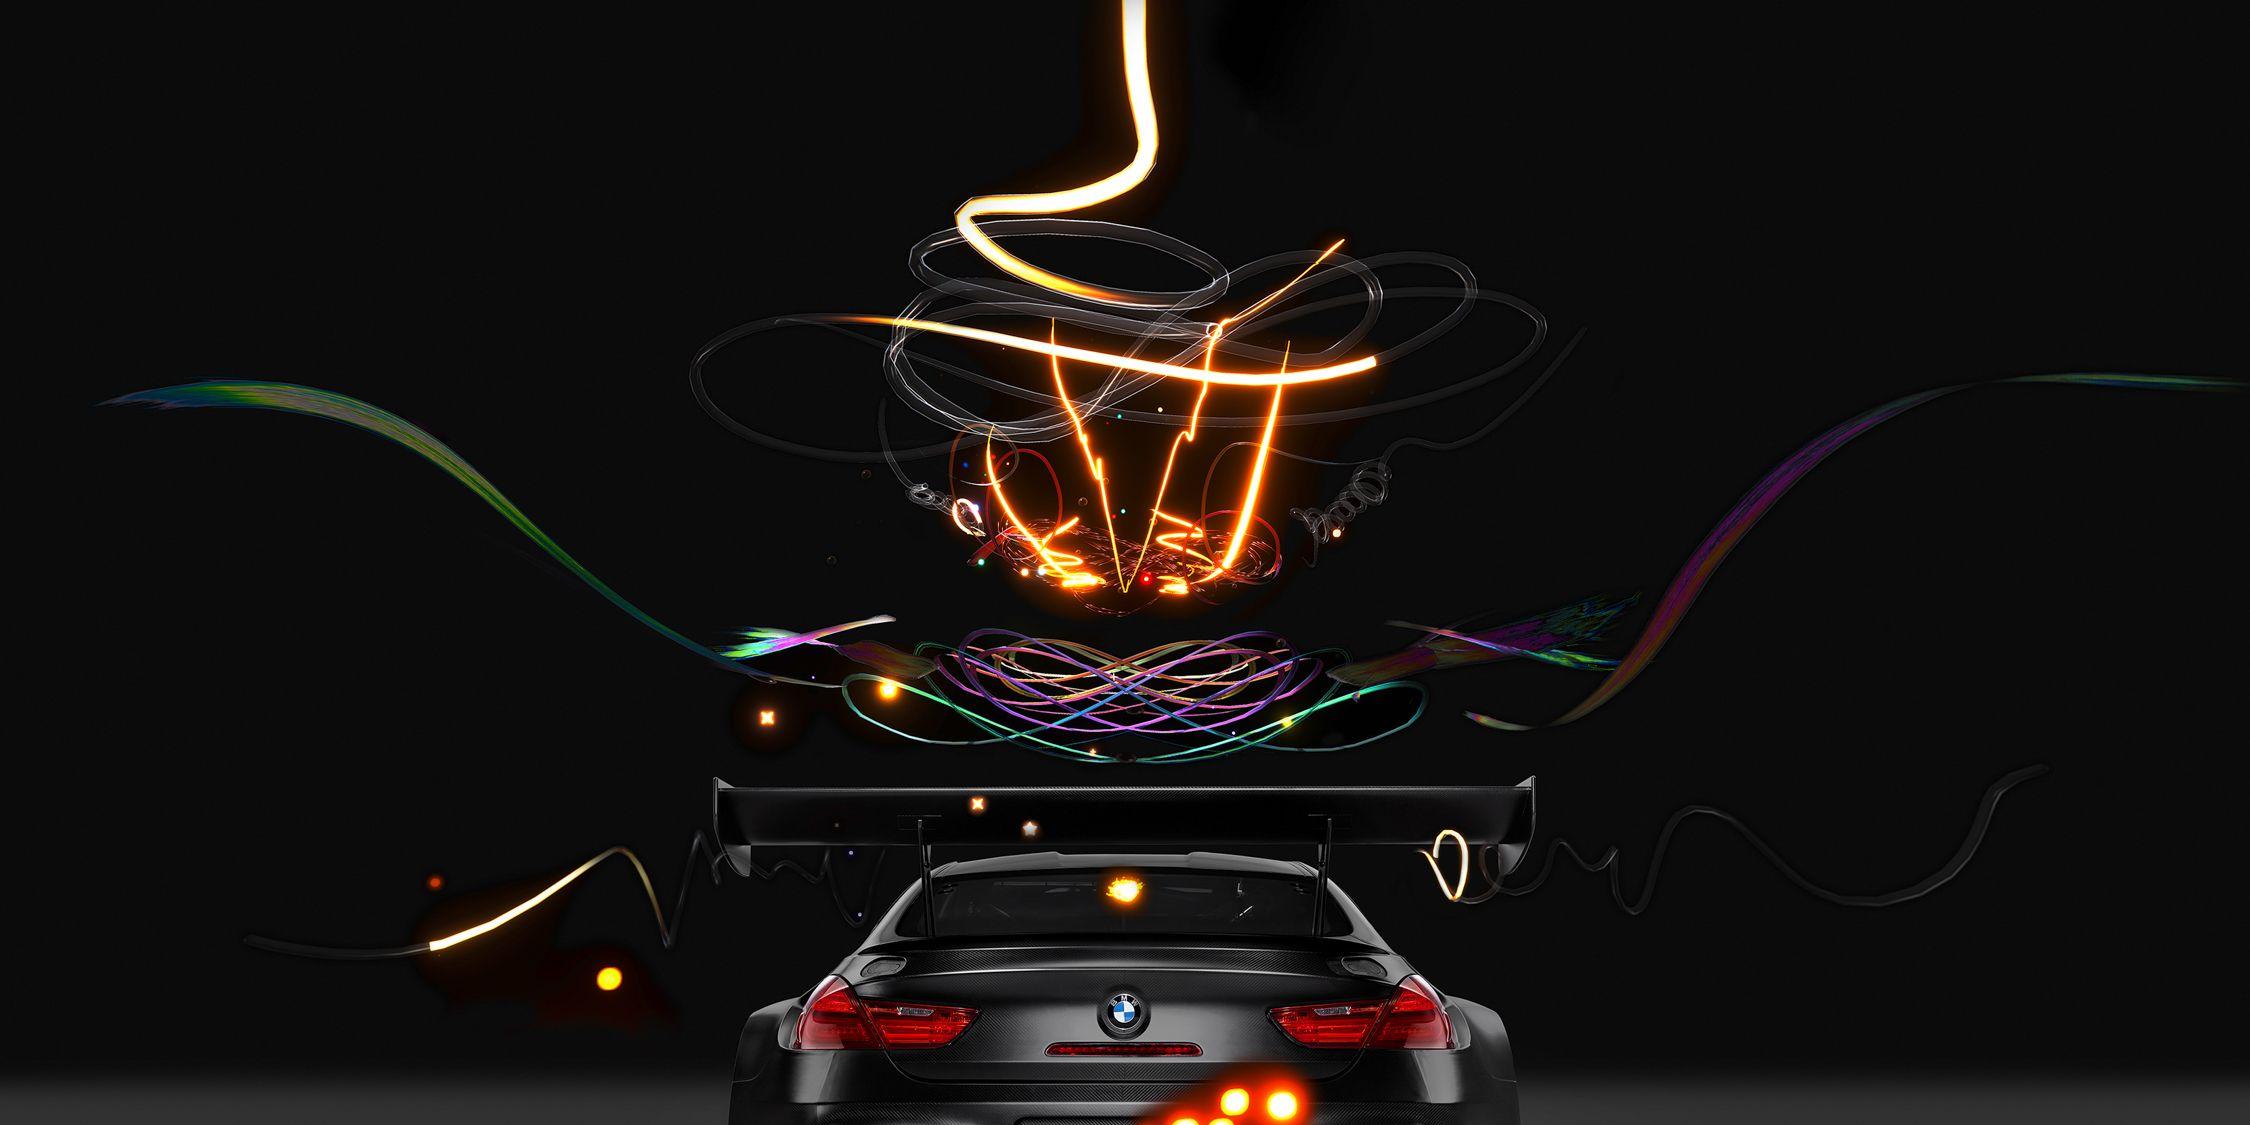 BMW M6 GT3 Art Car Exists in a Digital Alternate Reality